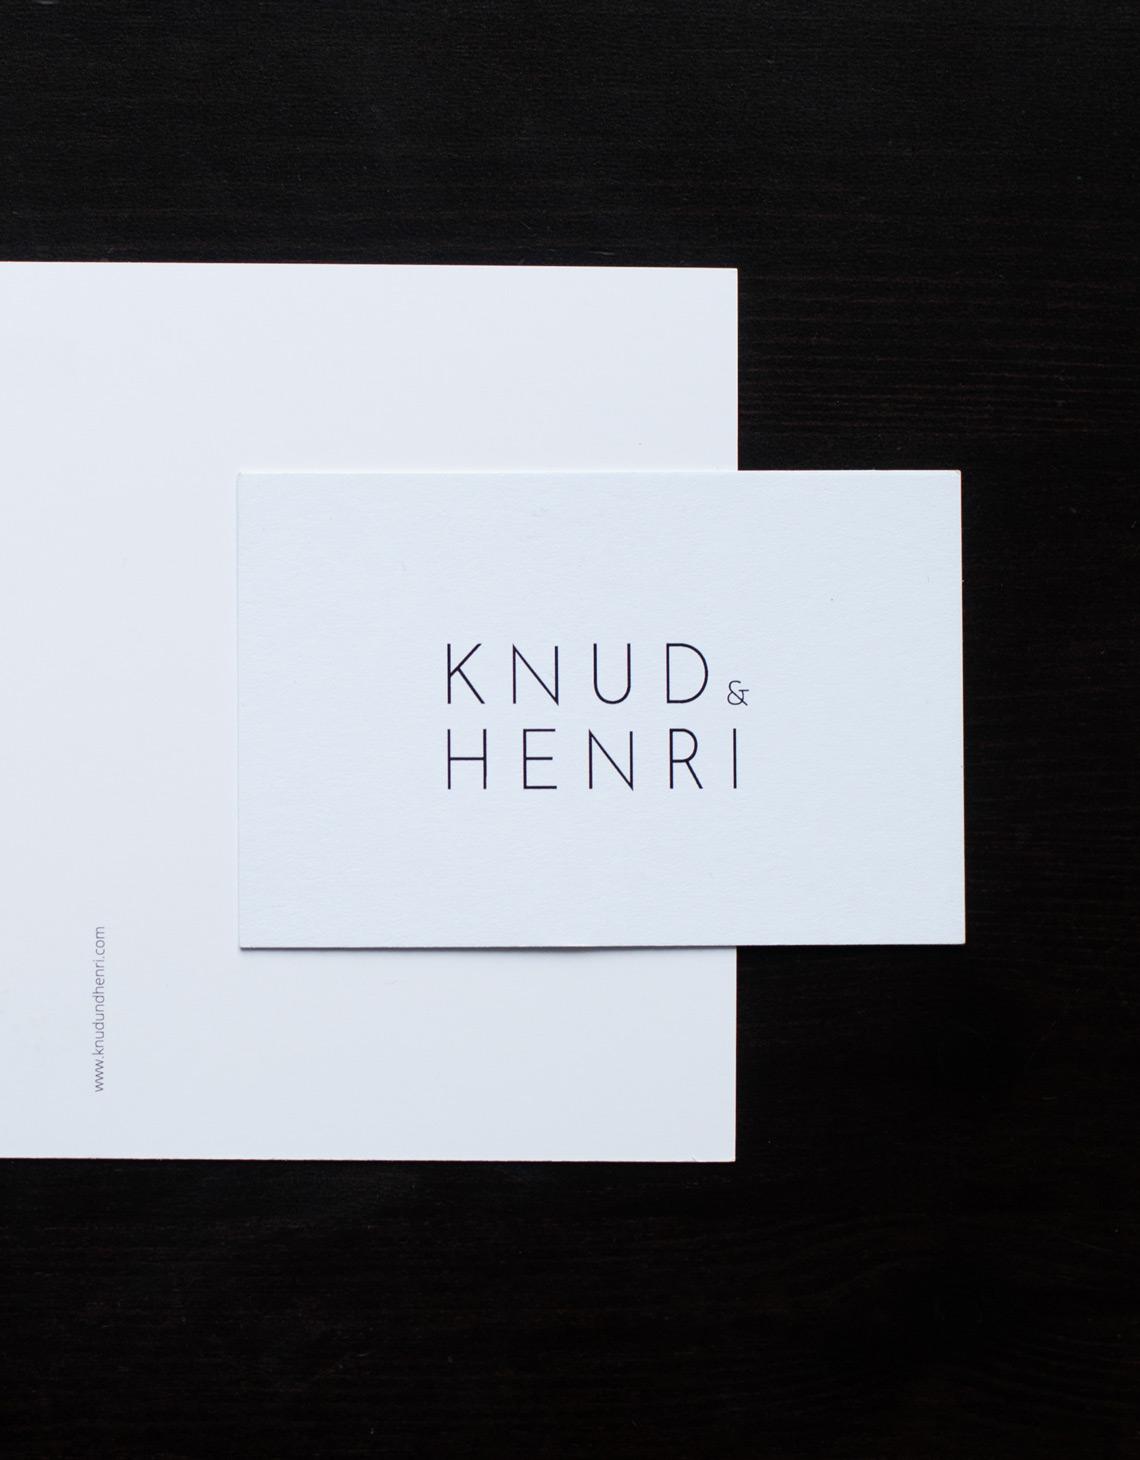 KnudUndHenri-hagendorfer-4